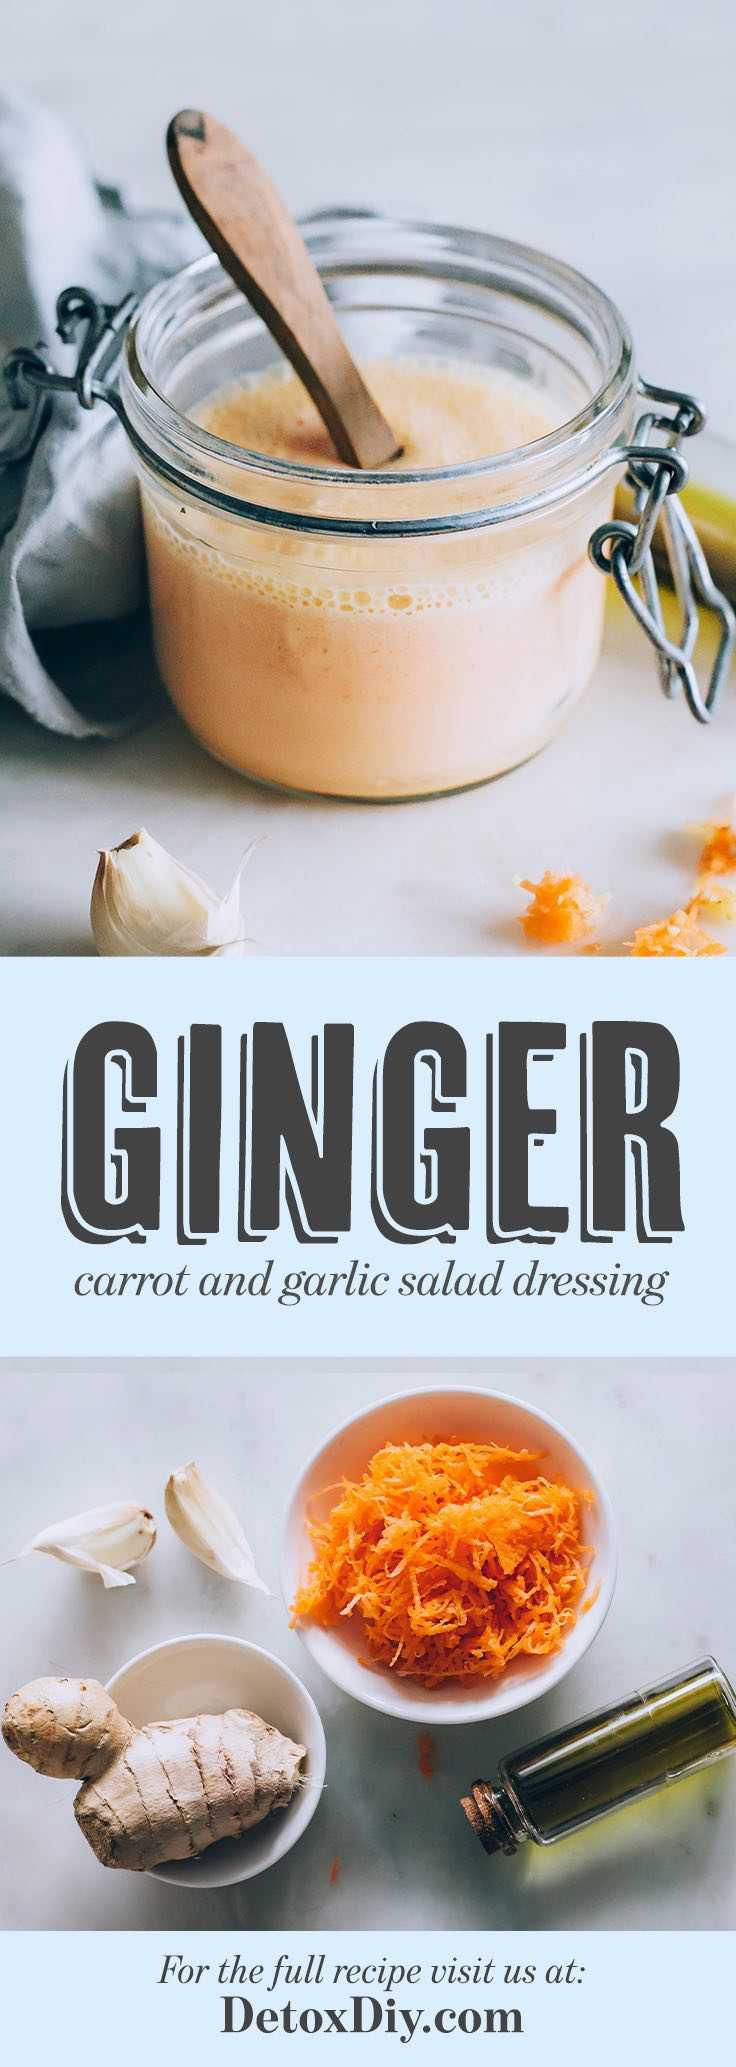 Homemade Carrot Ginger Salad Dressing with Avocado Oil